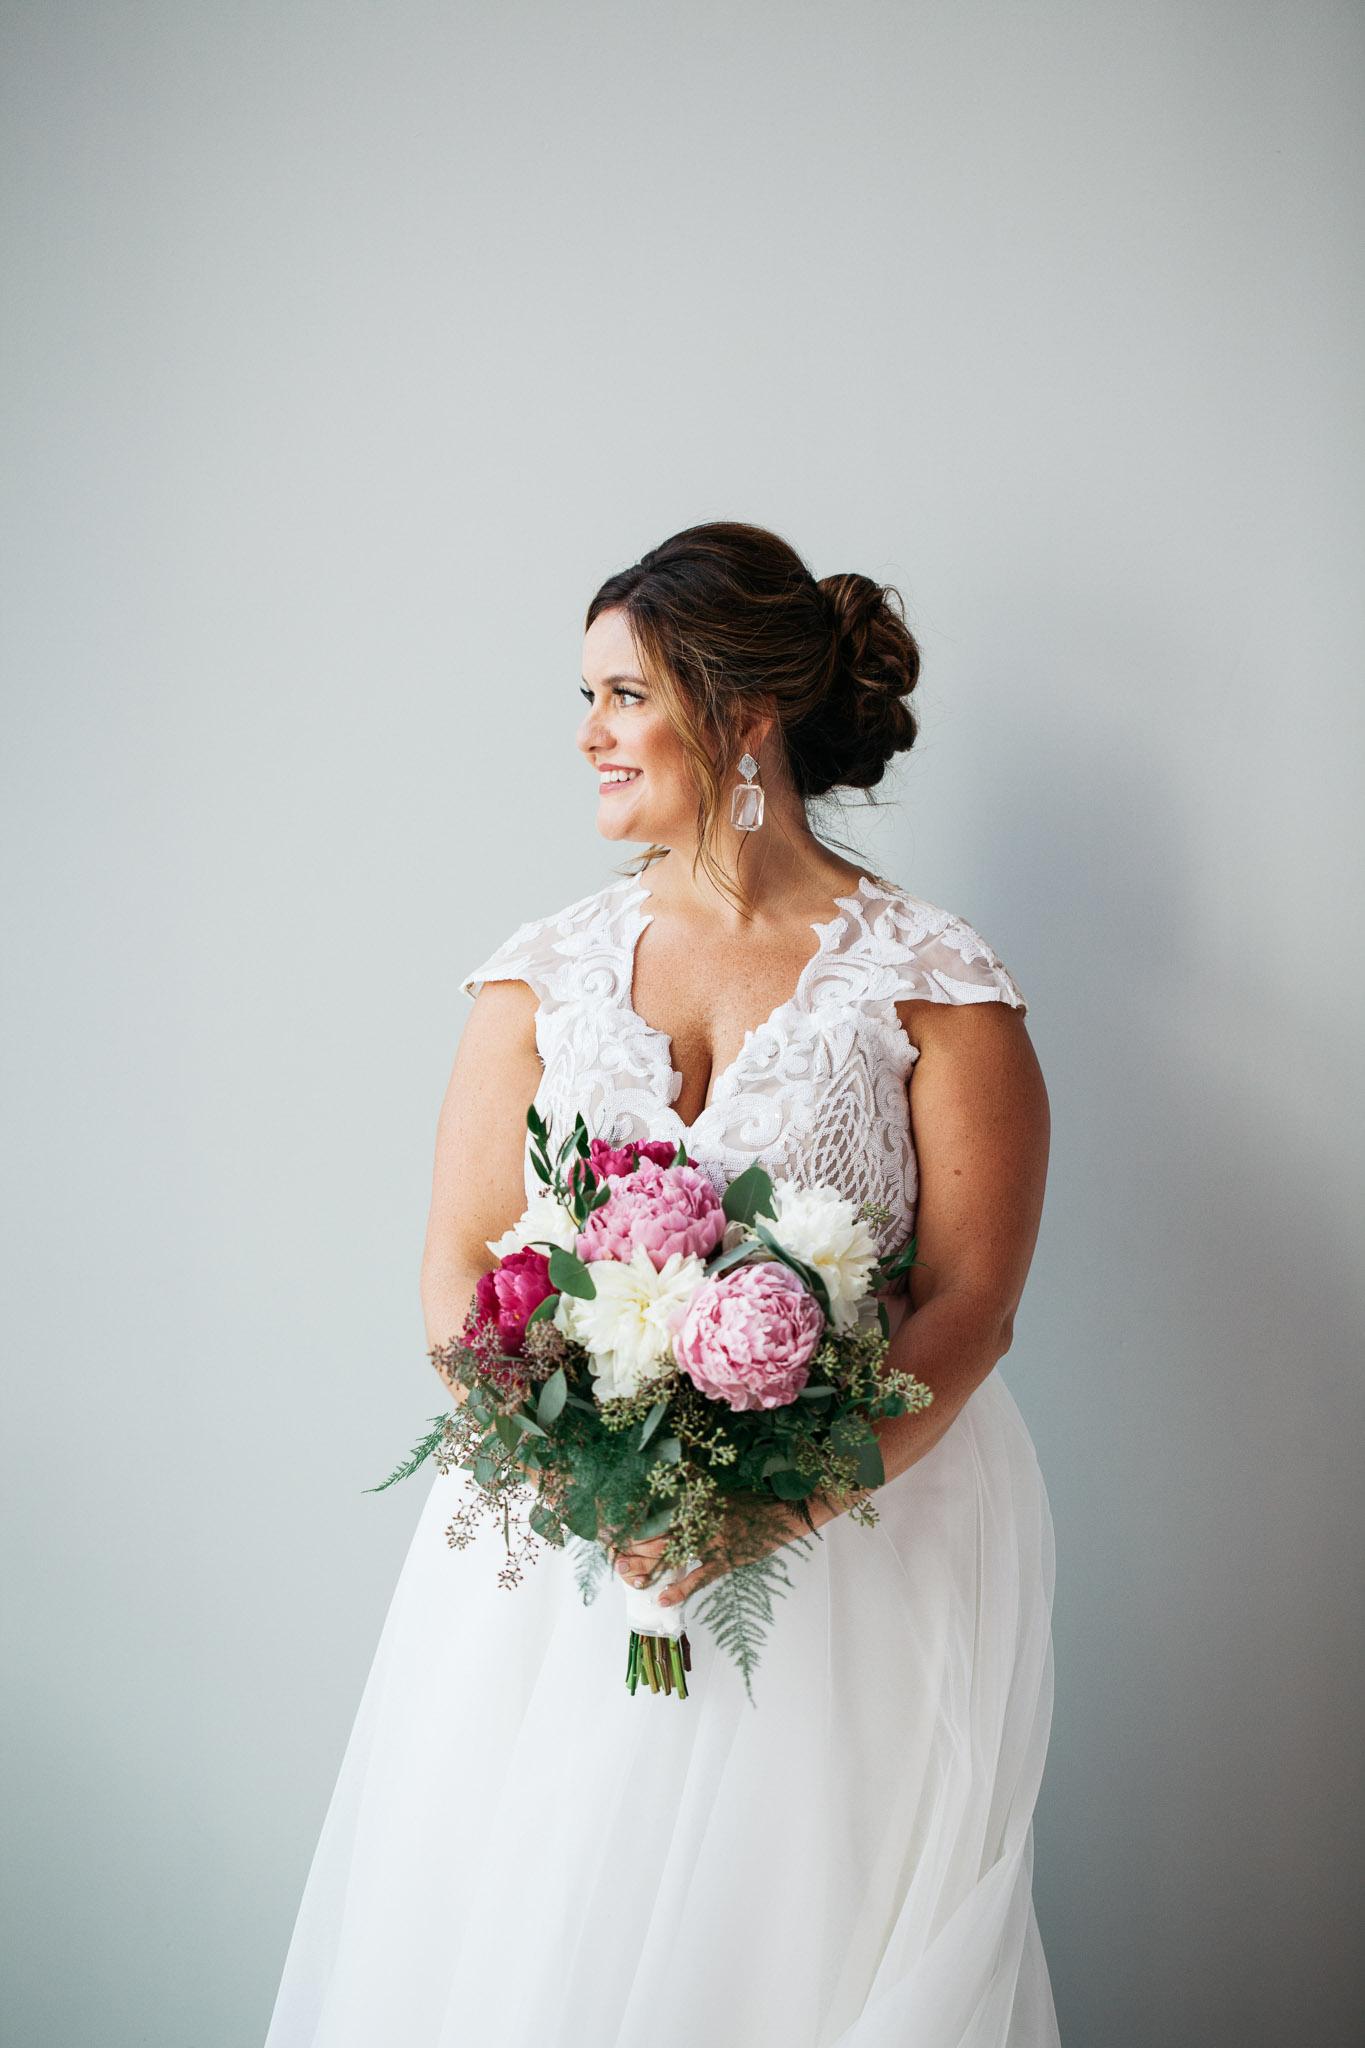 Carnegie Science Center Wedding, Pointview Hall, Pittsburgh wedding Mariah Fisher-0465.jpg